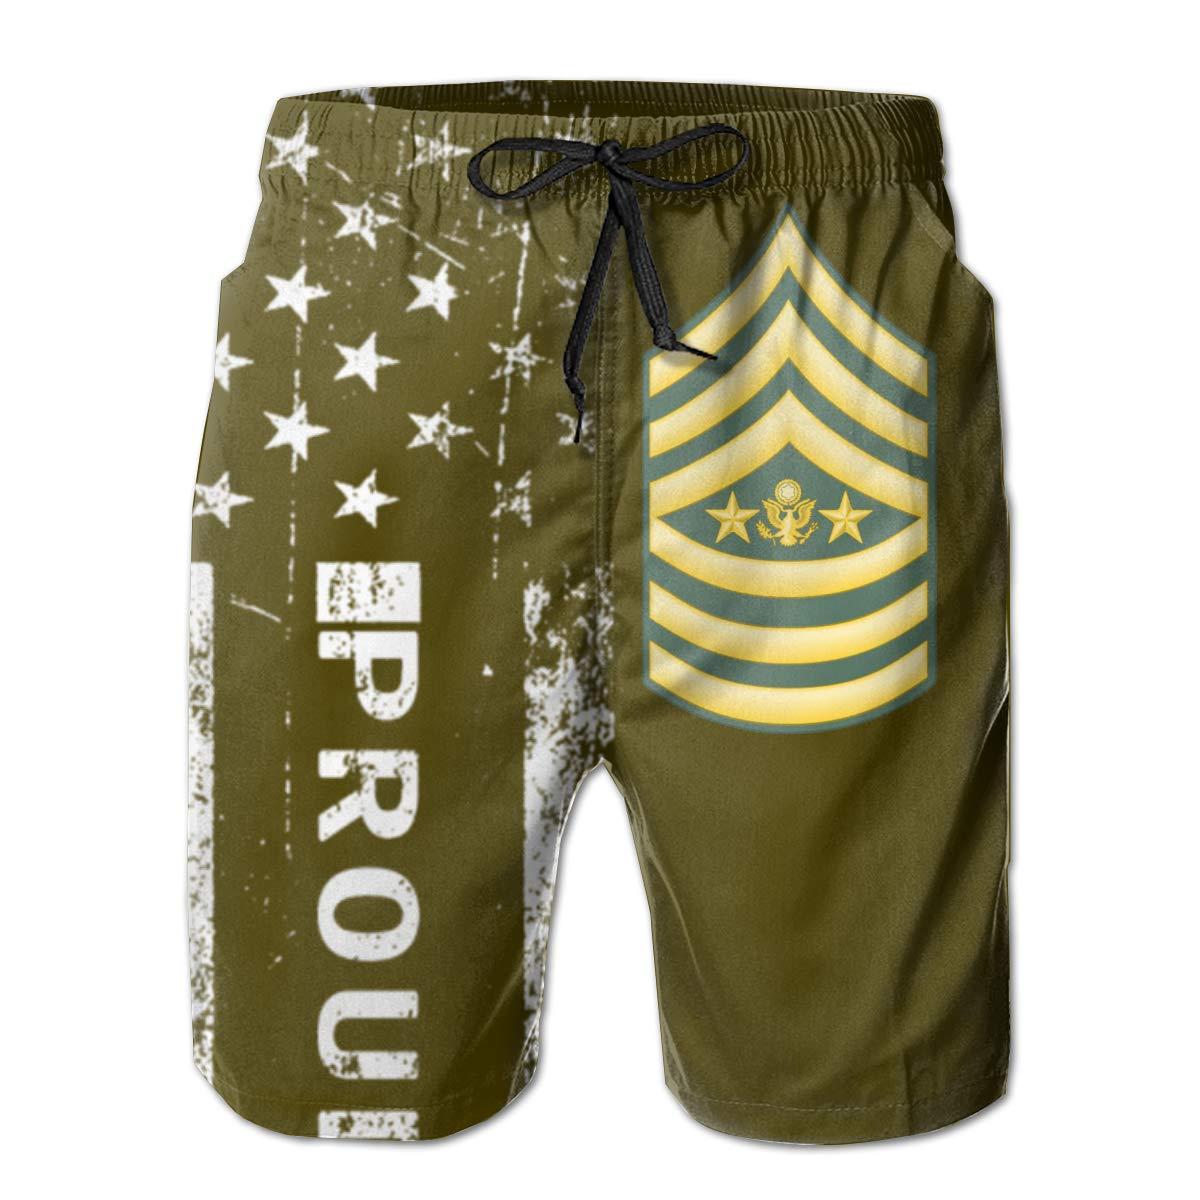 SUNSUNNY US Army Sergeant Major Mens Boardshorts Swim Trunks Beach Athletic Shorts